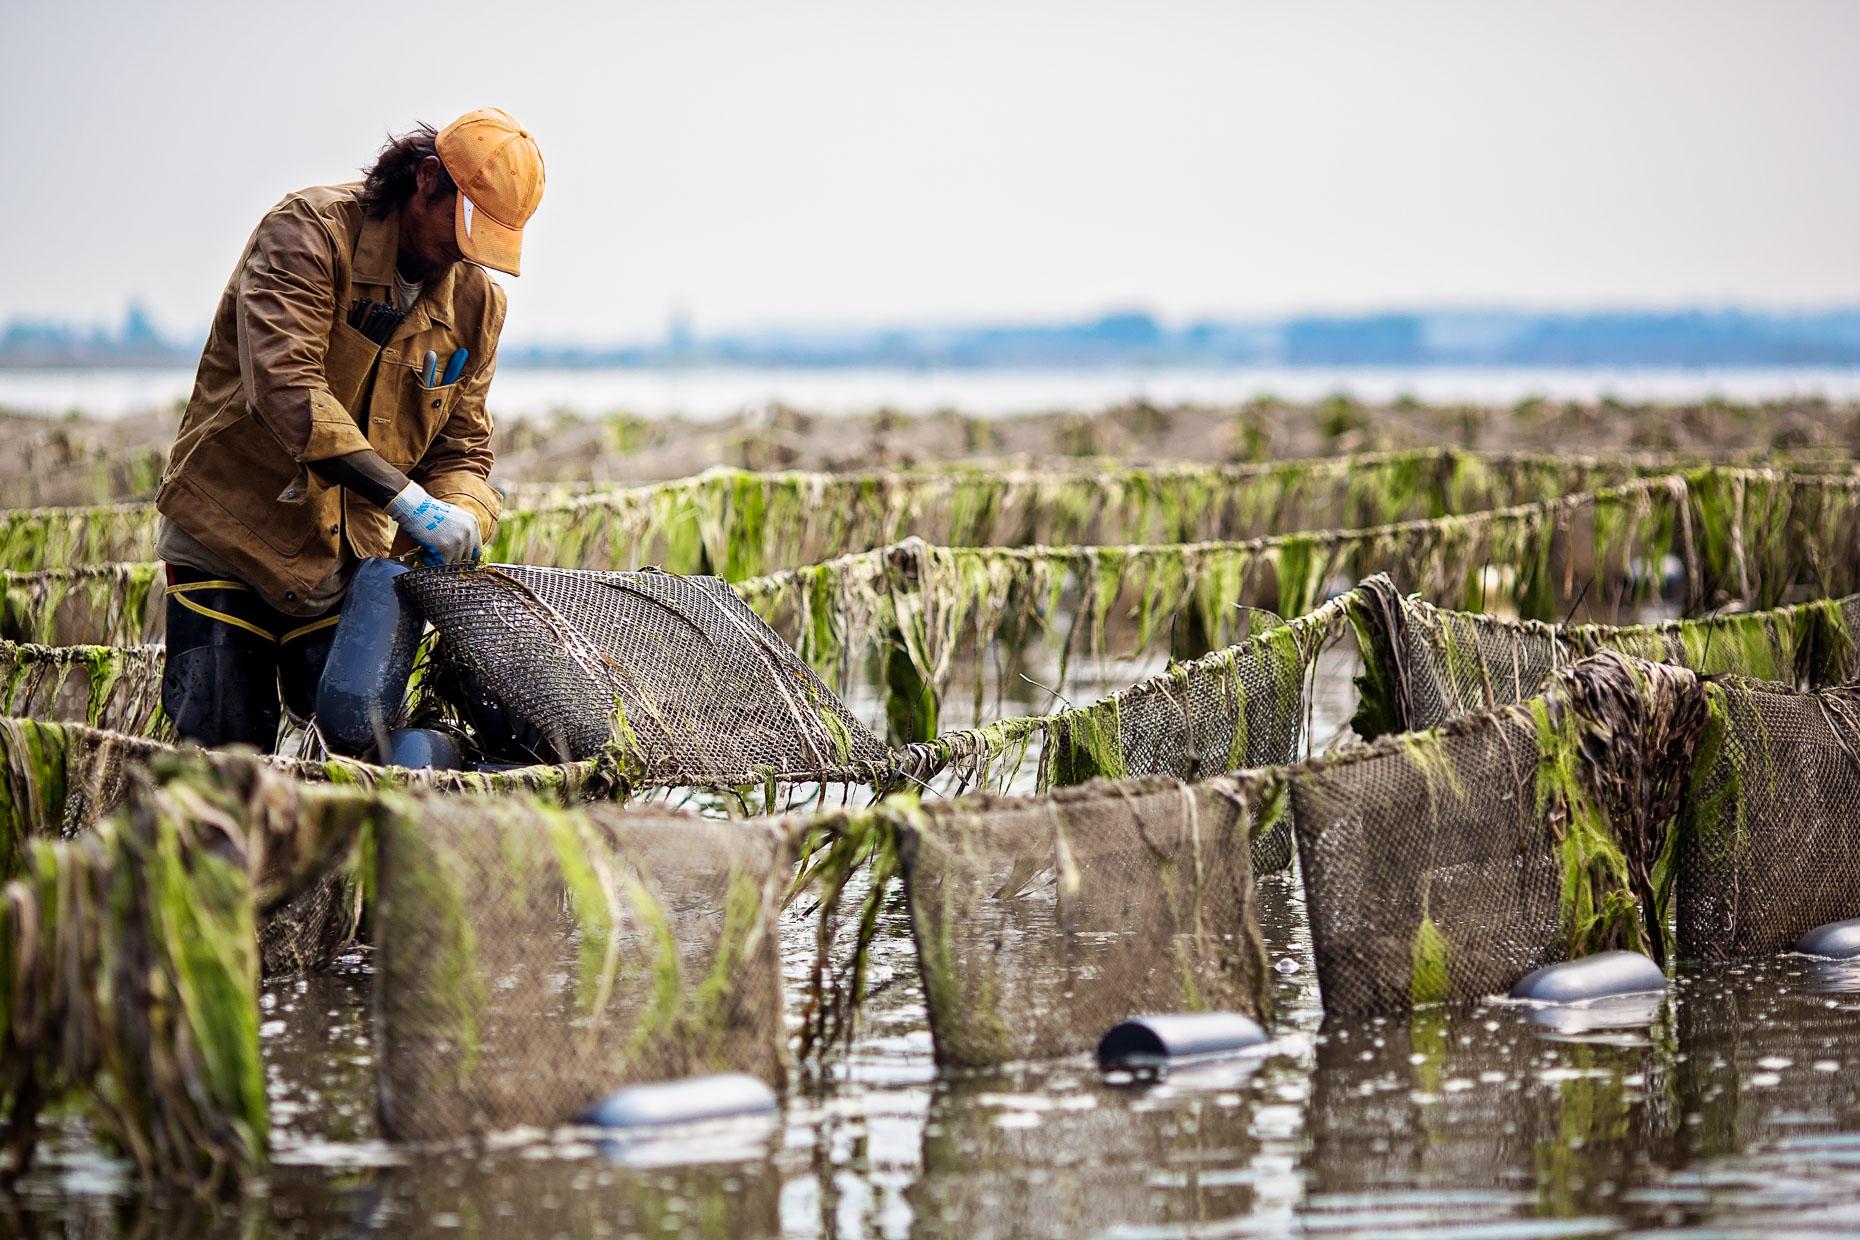 FILSON - Taylor Shellfish Farms